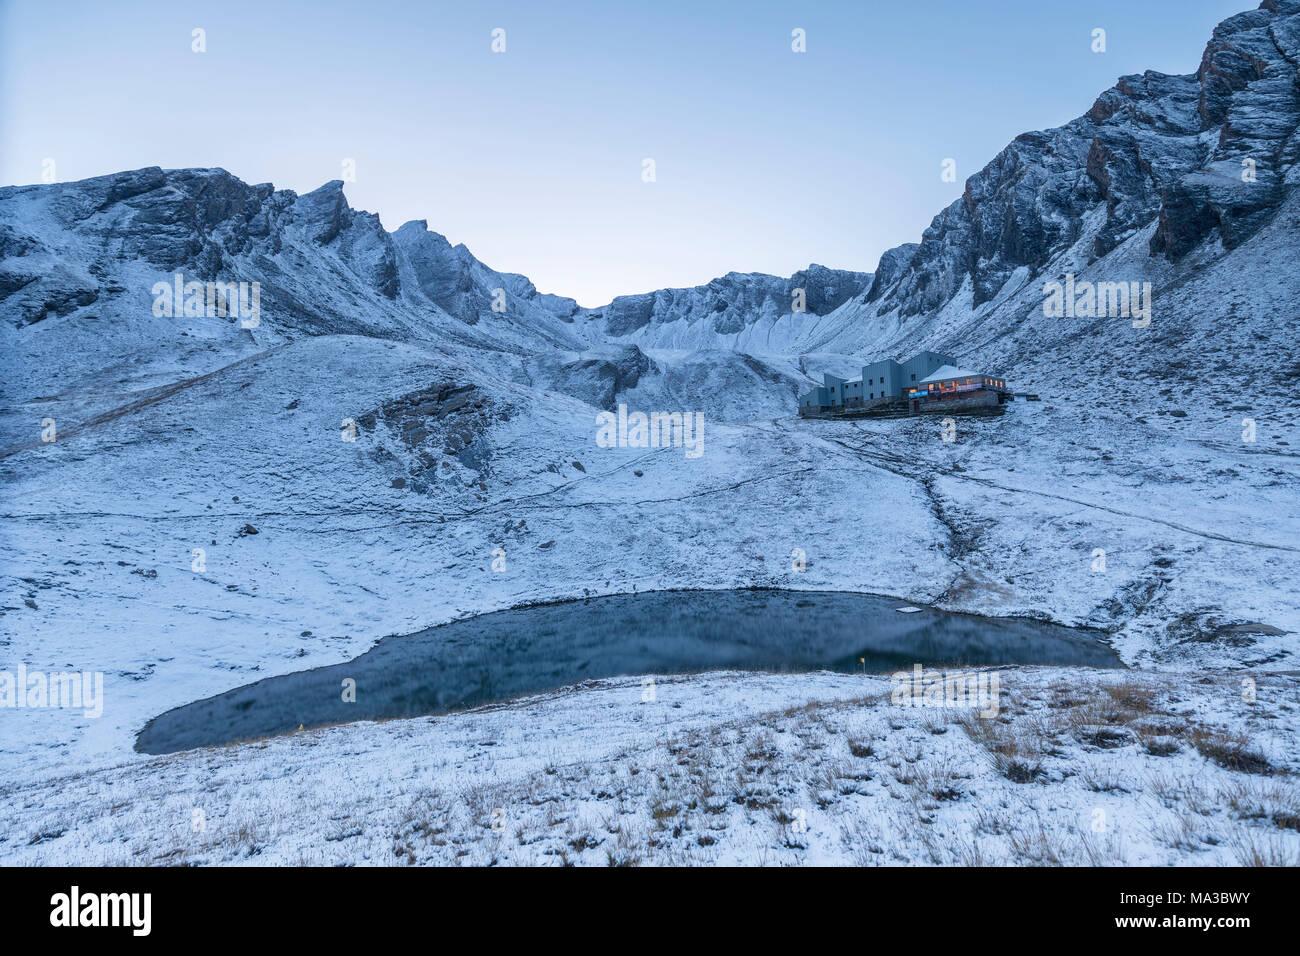 Lake below Refuge Frassati at dusk with snow, Saint Rhemy en Bosses, Gran San Bernardo valley, Aosta Valley, Italy, Europe Stock Photo